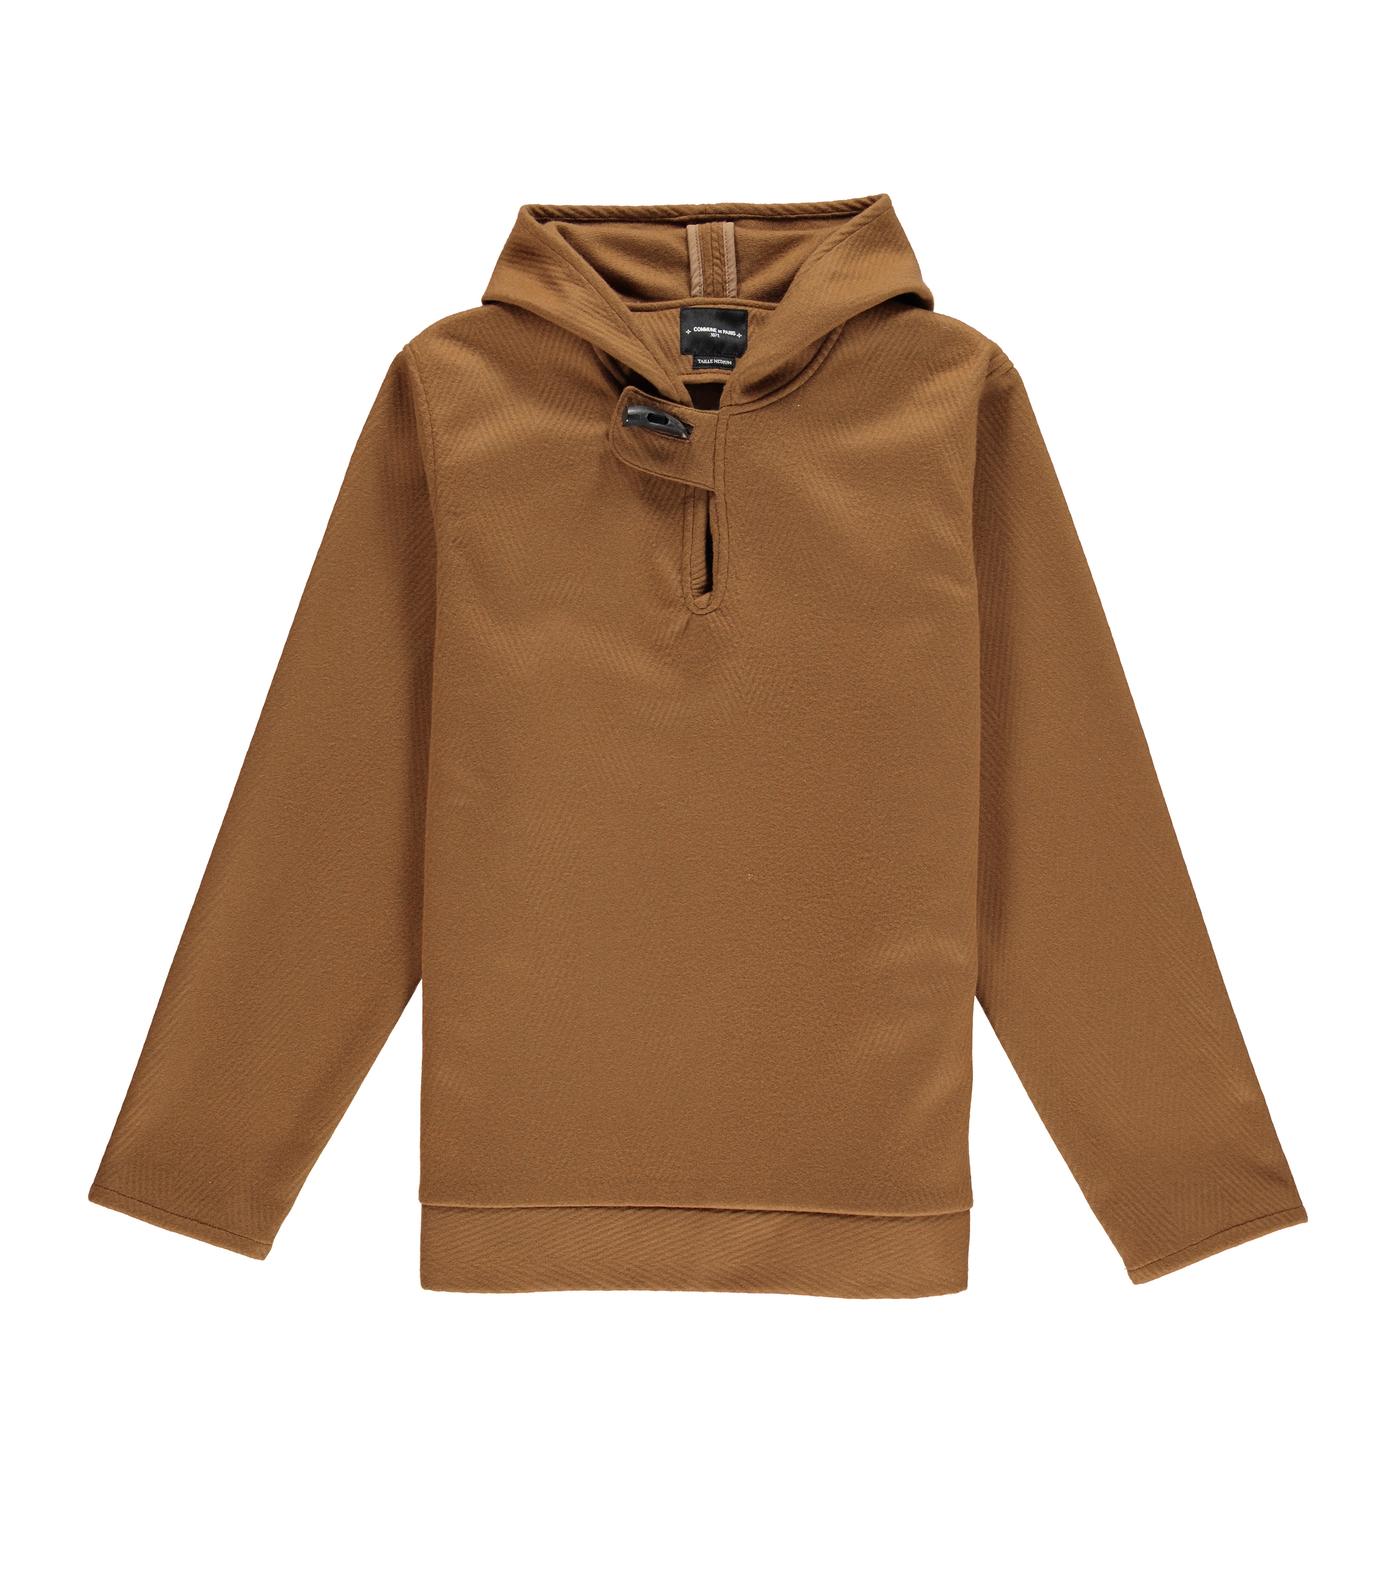 Pea jacket Gabriel - Camel